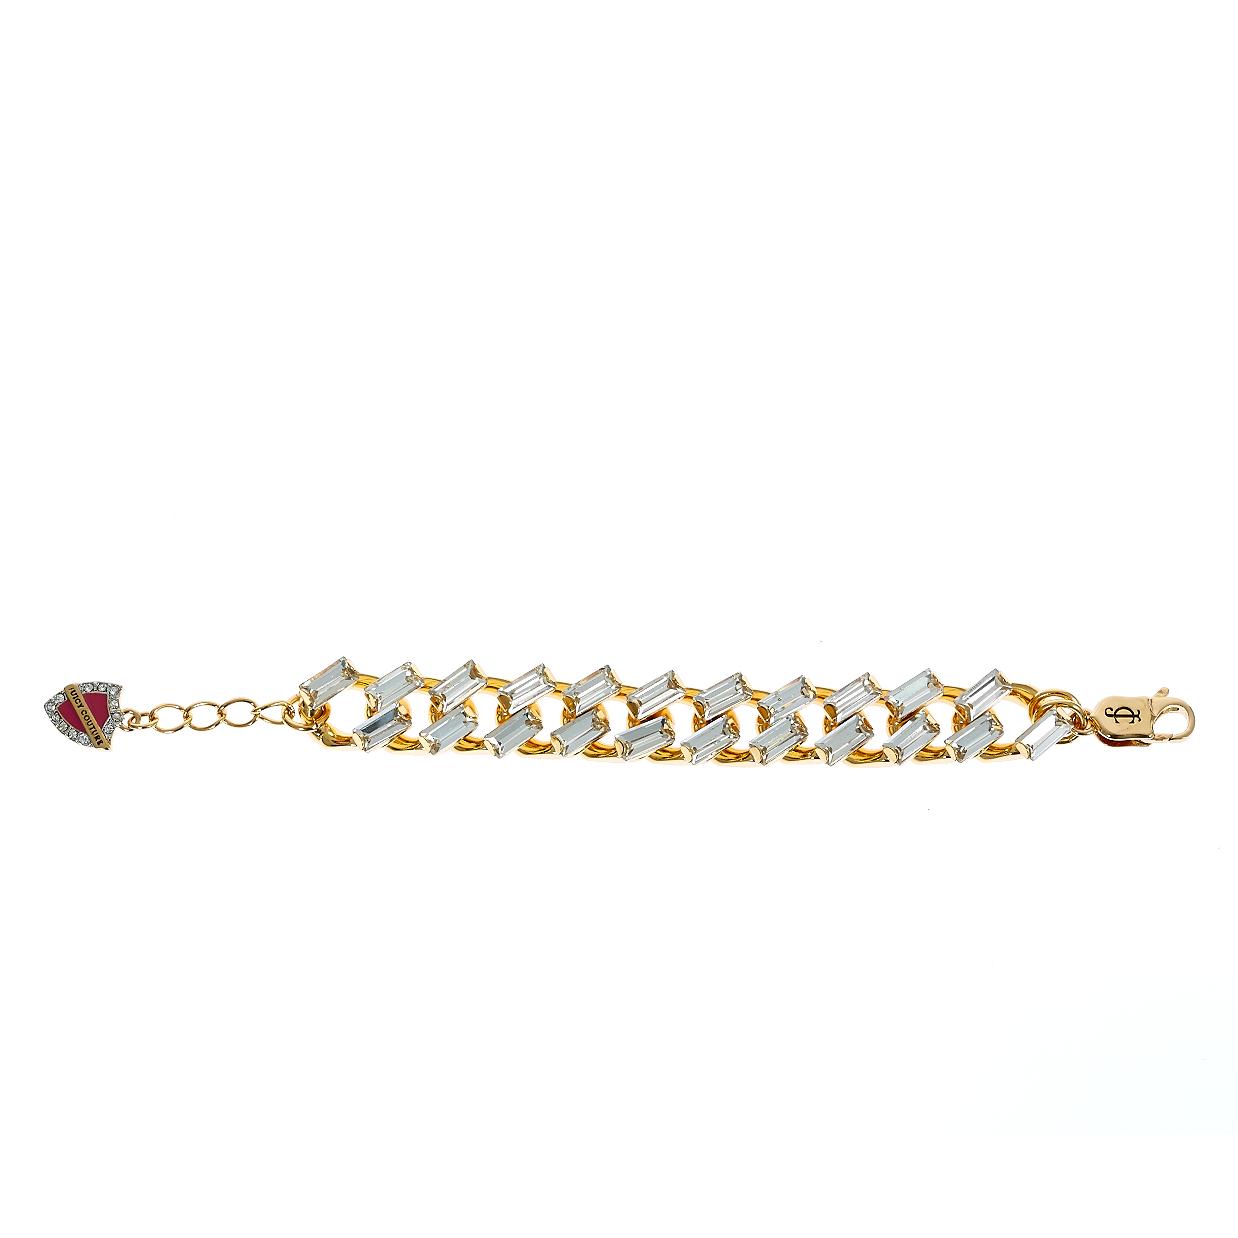 JUICY COUTURE - Γυναικείο βραχιόλι Juicy Couture γυναικεία αξεσουάρ κοσμήματα βραχιόλια